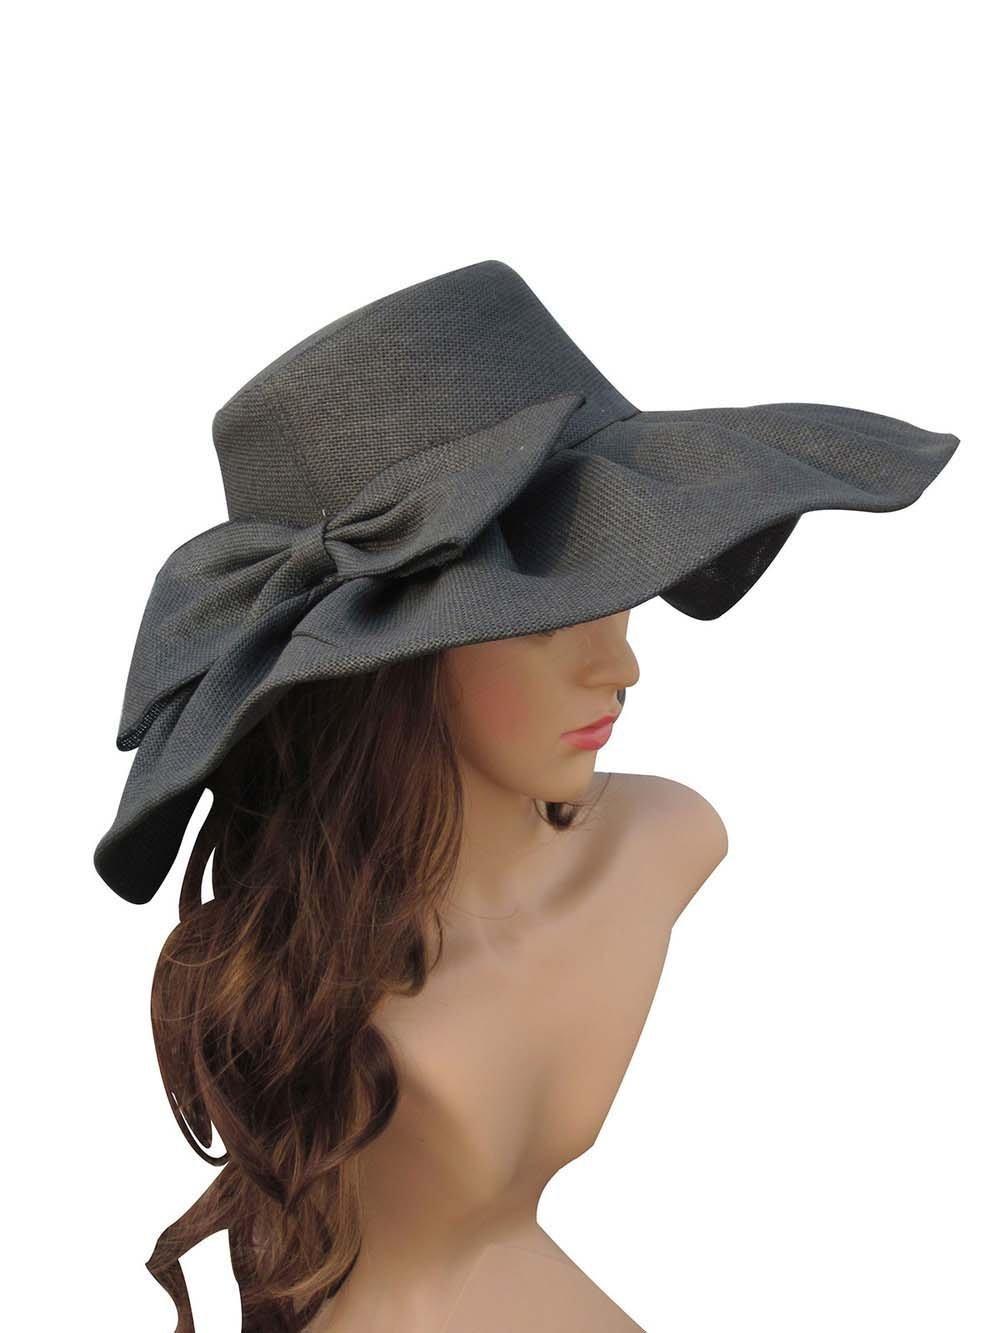 db9557e1a7087 Get Quotations · LOVEHATS Summer Hat Women Wide Brim Sun Hat Wedding Church  Sea Beach Hats Floppy Ladies Hat